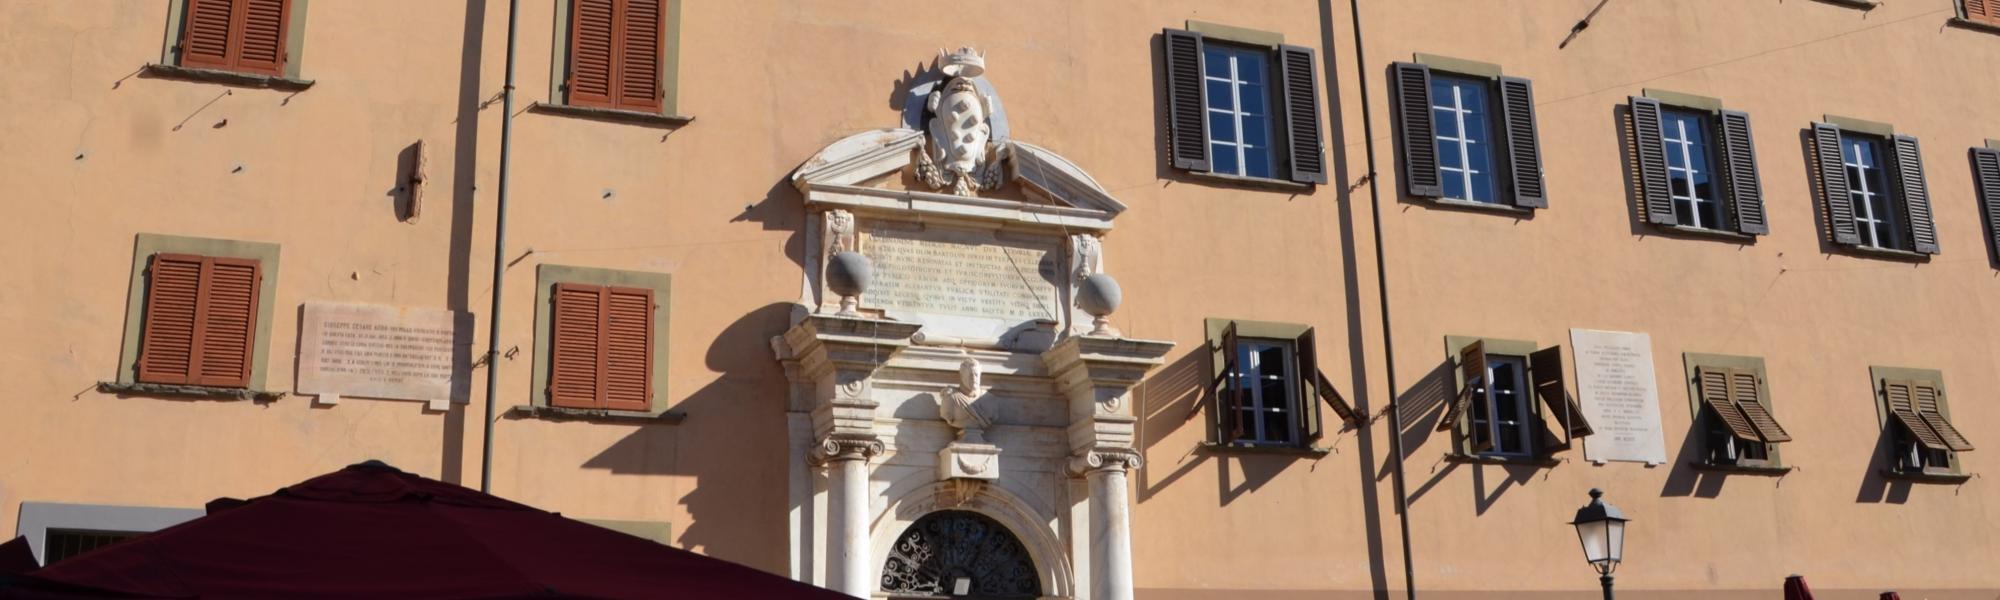 Collegio Ferdinando (L. Corevi, Comune di Pisa)